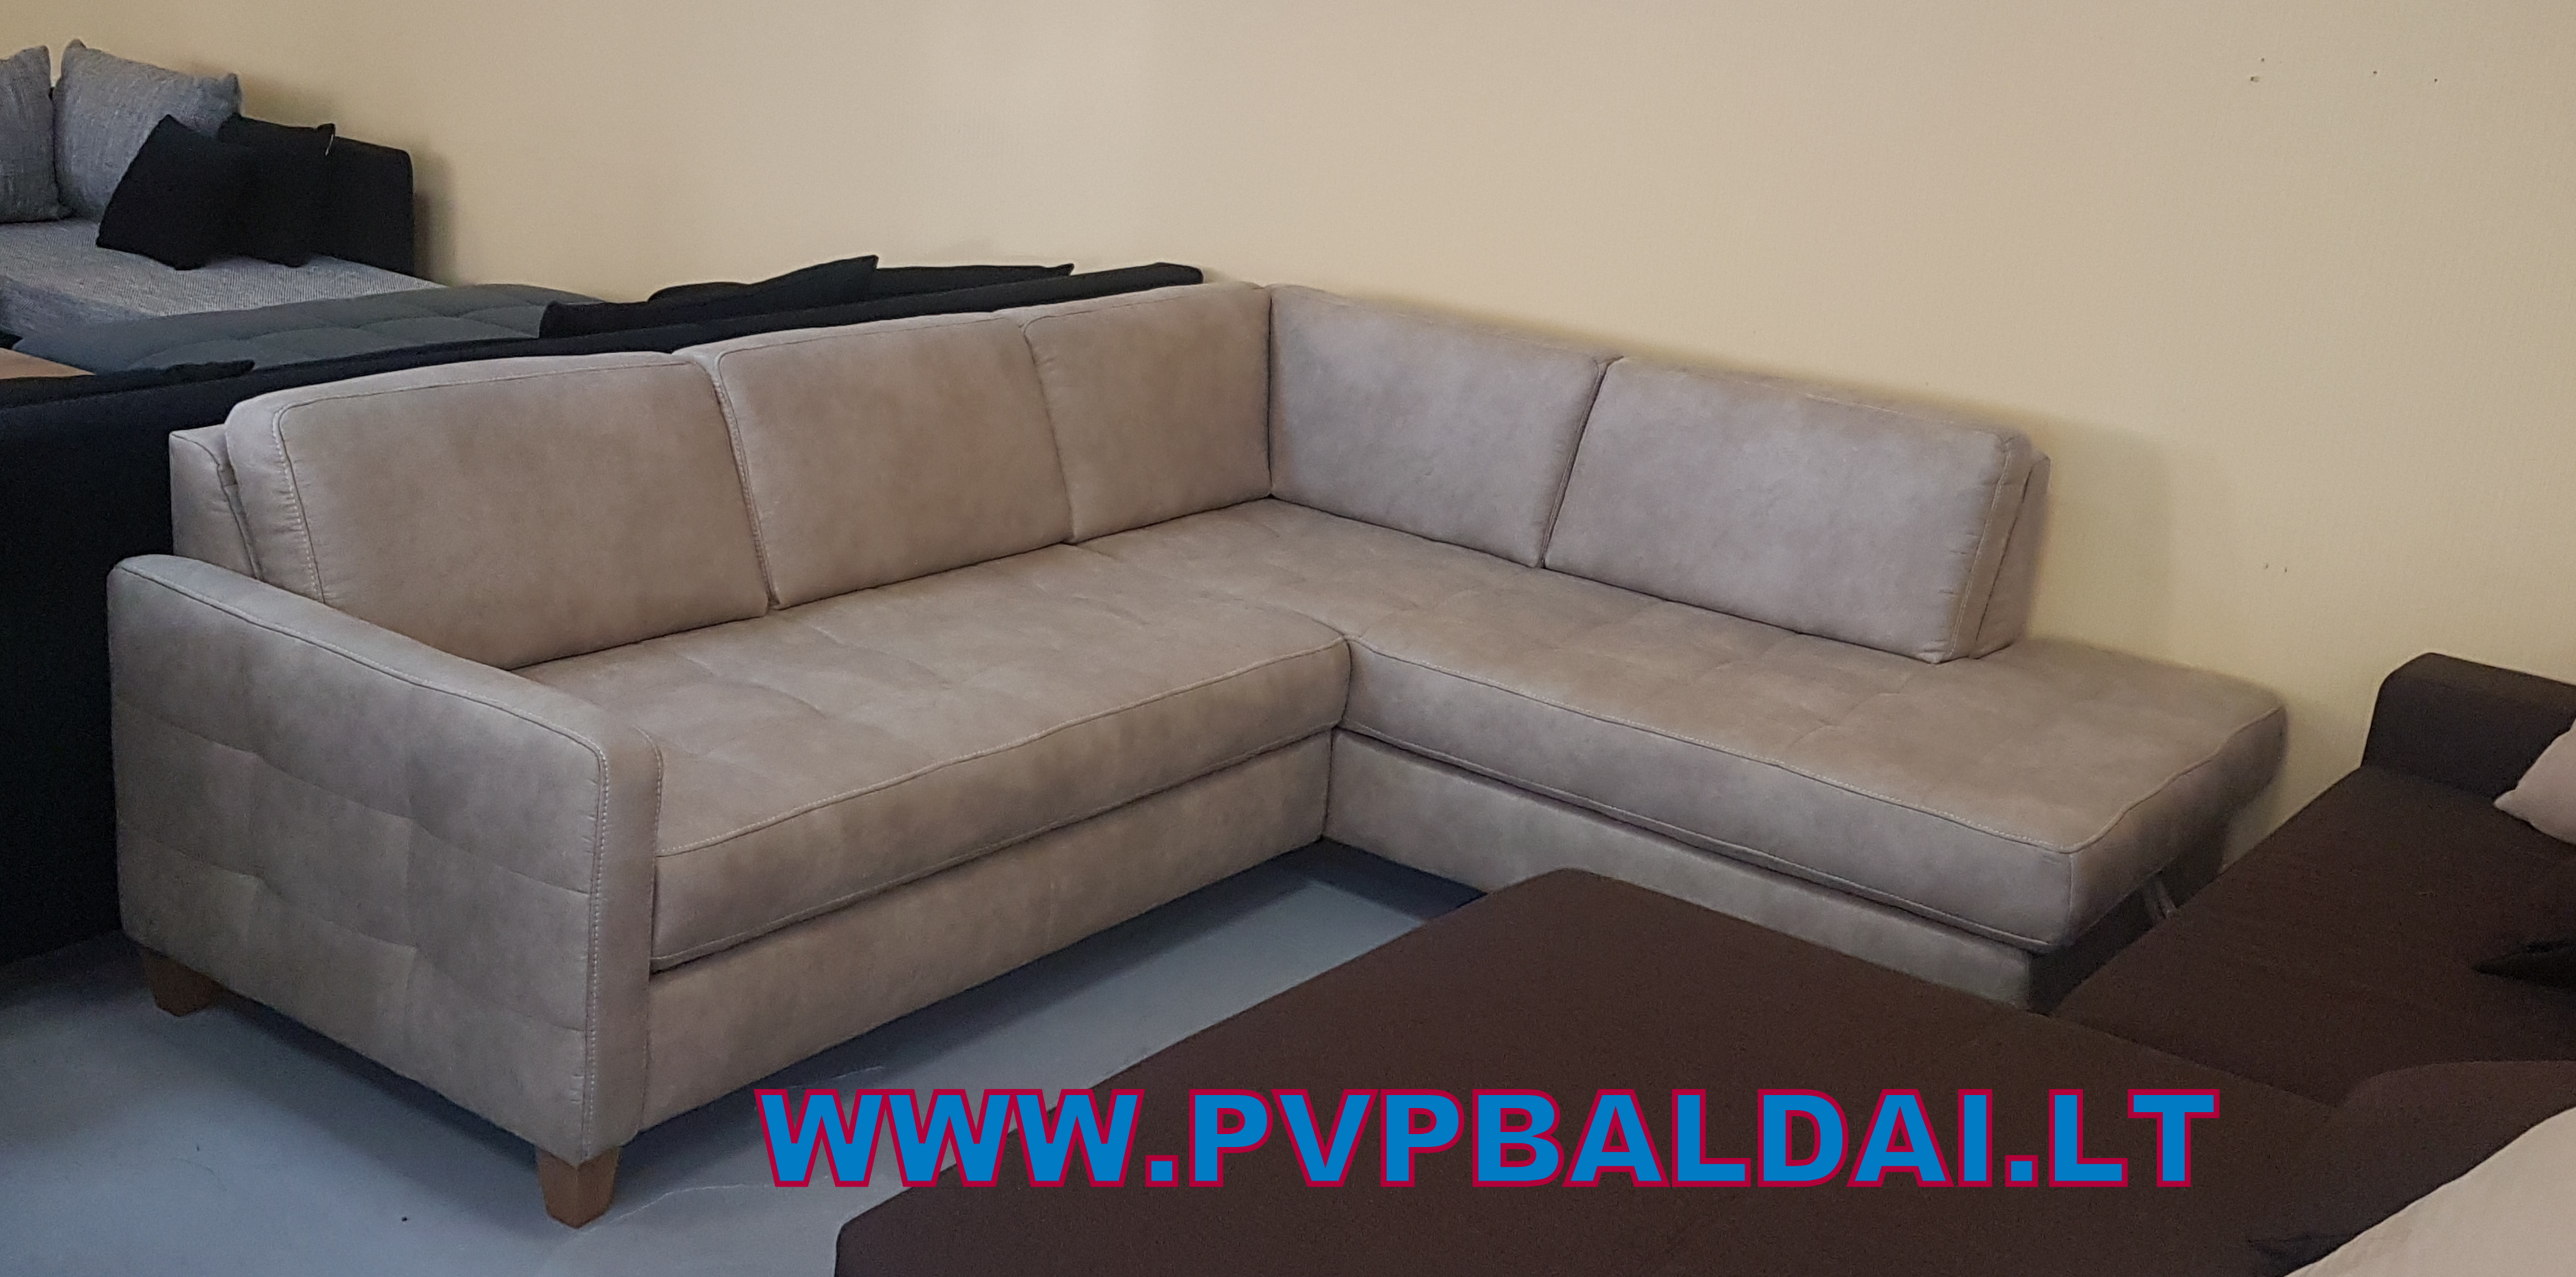 pvp baldai4